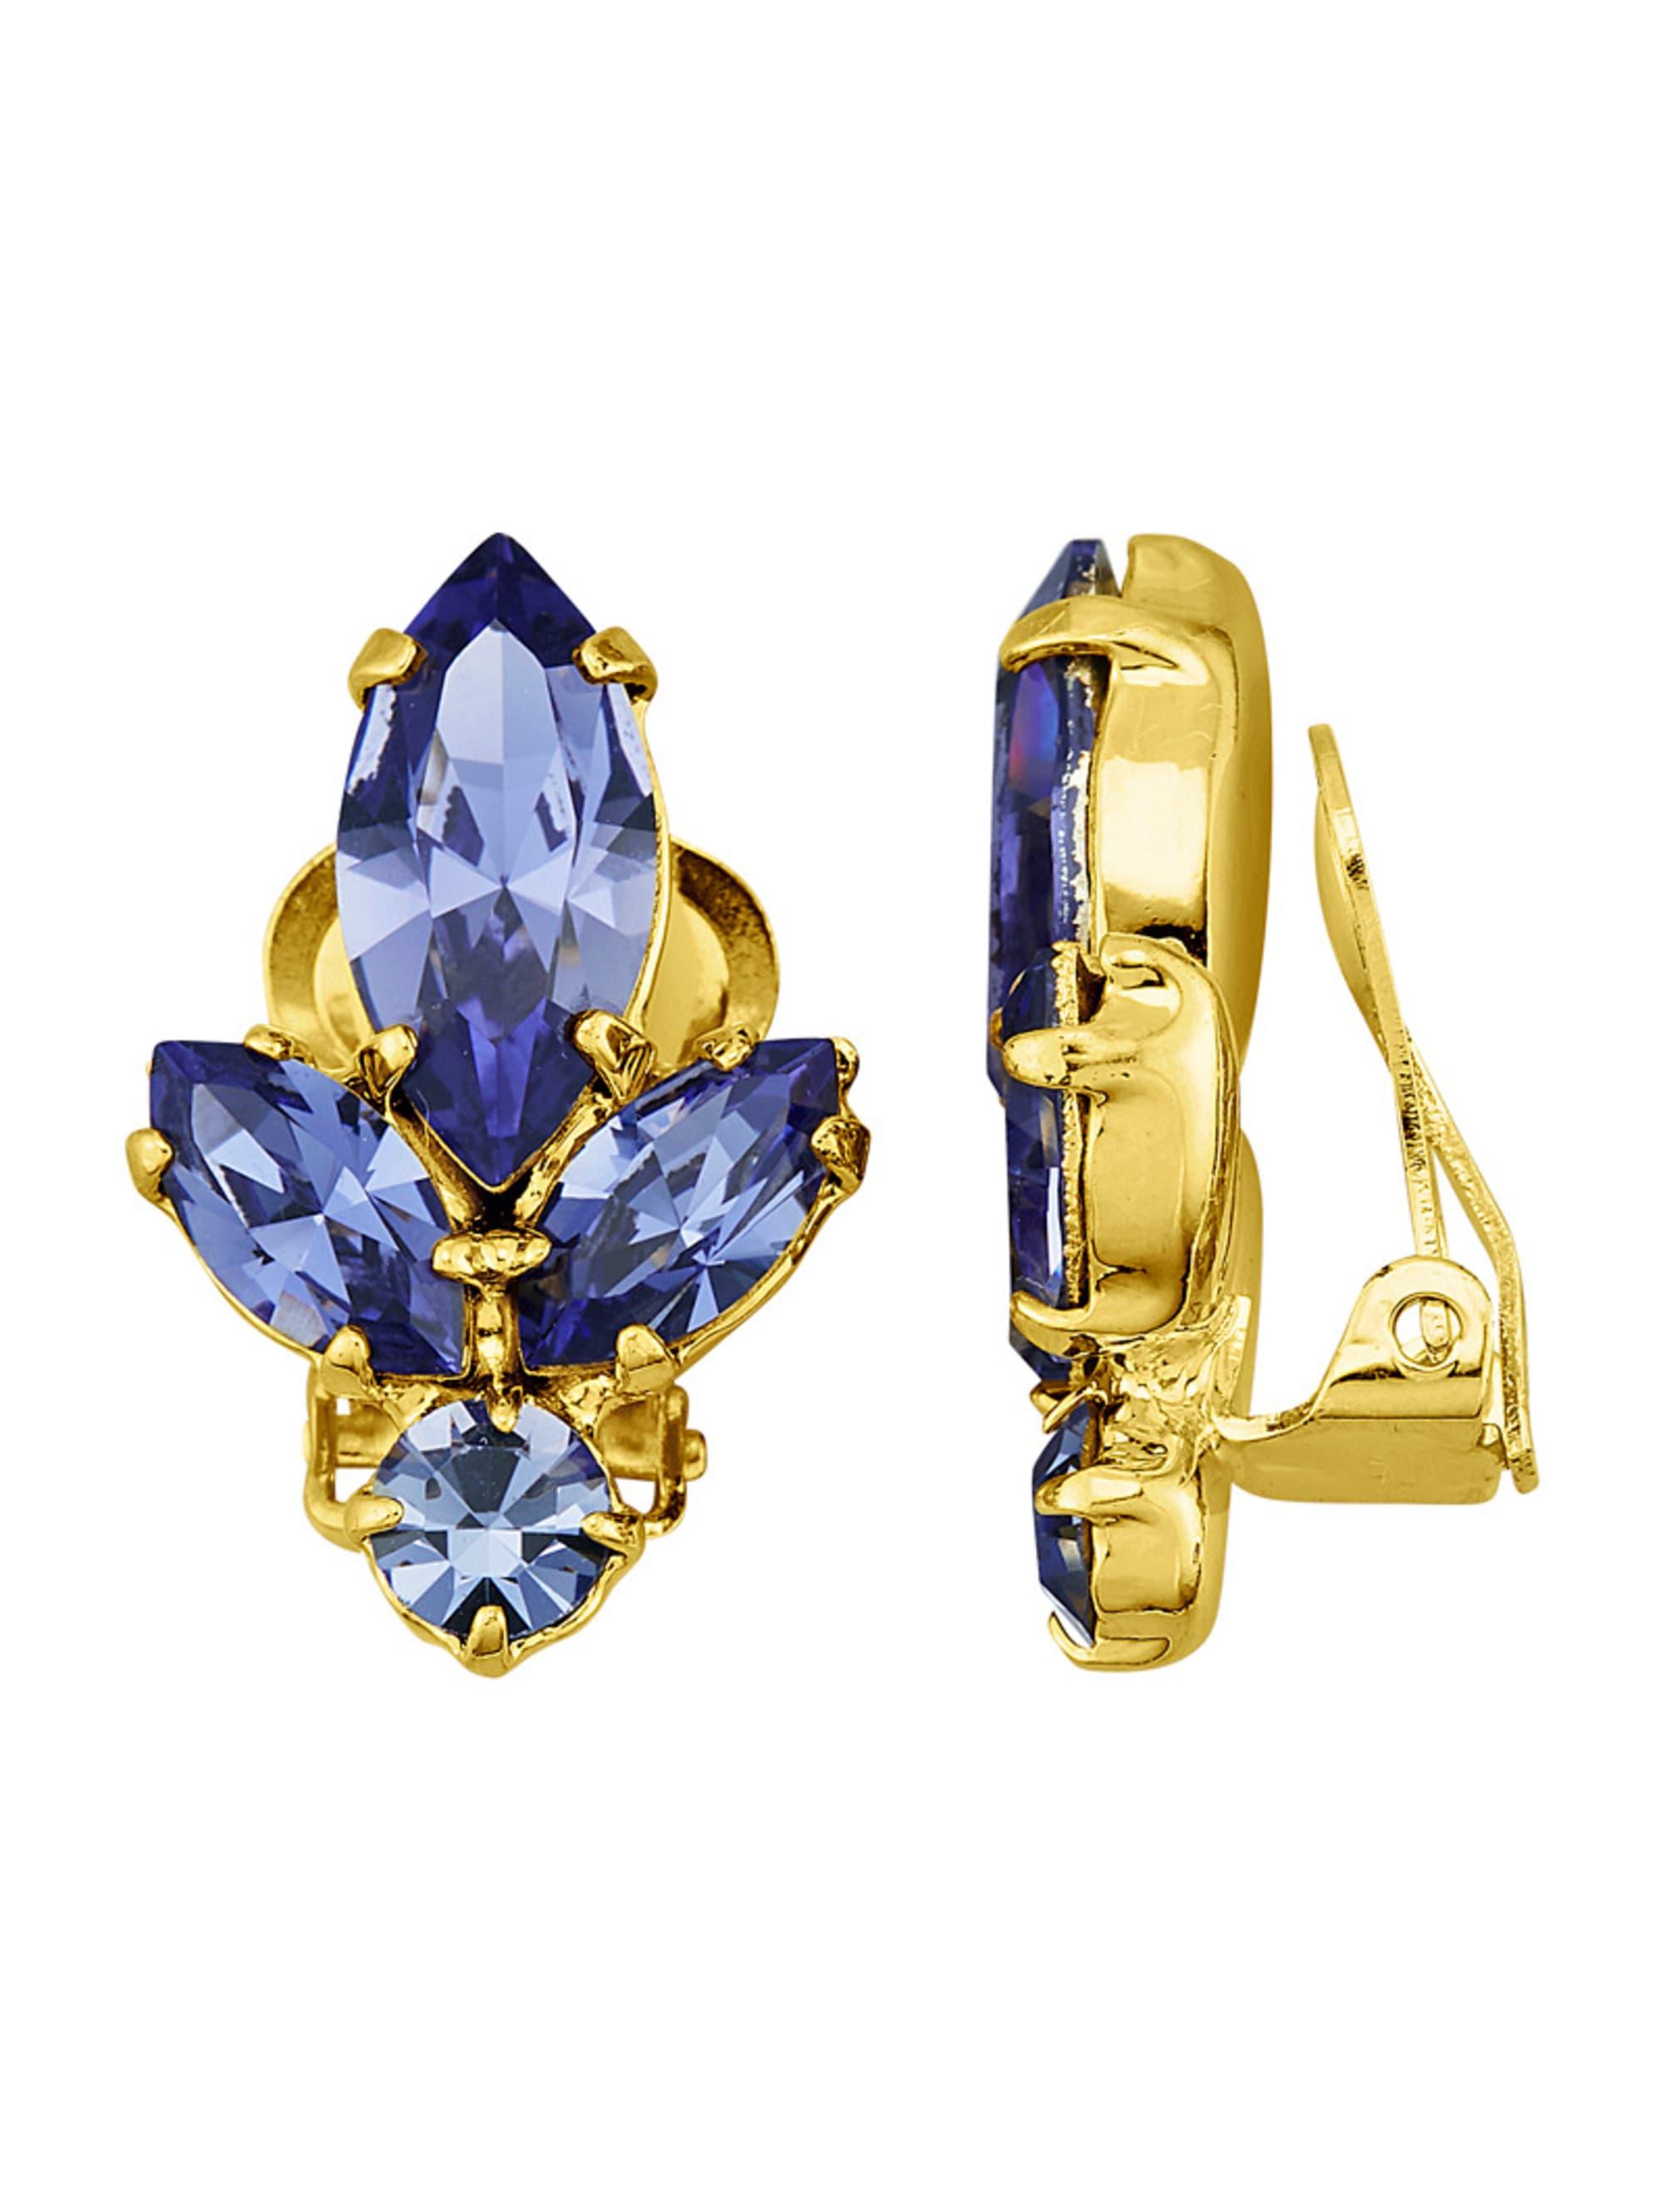 Golden Style Ohrclips mit 8 tansanitfarbenen Kristallen ZyY3i